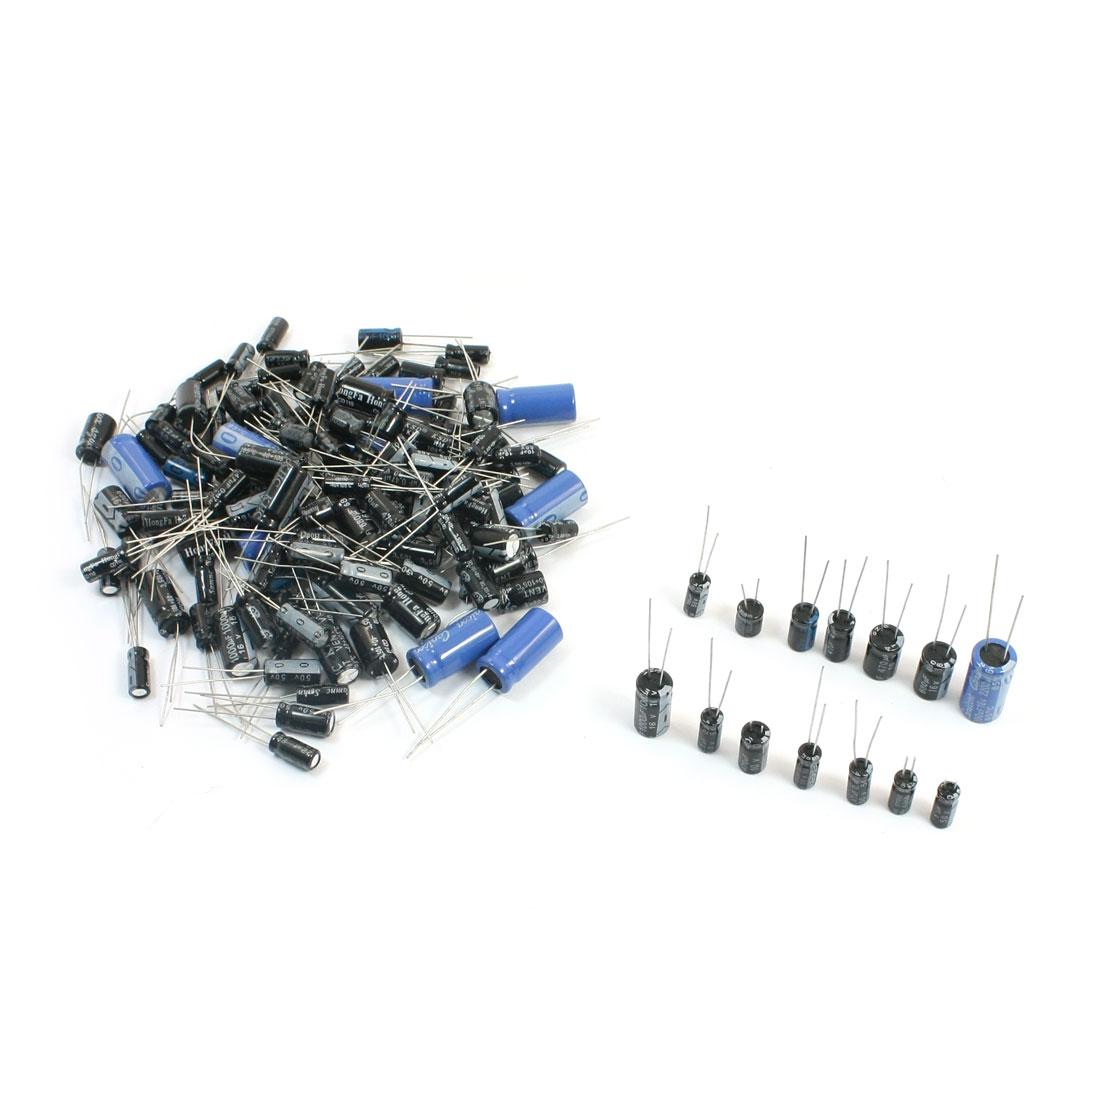 140Pcs 14 Values 105C Radial DIP 0.47uF-2200uF Electrolytic Capacitors